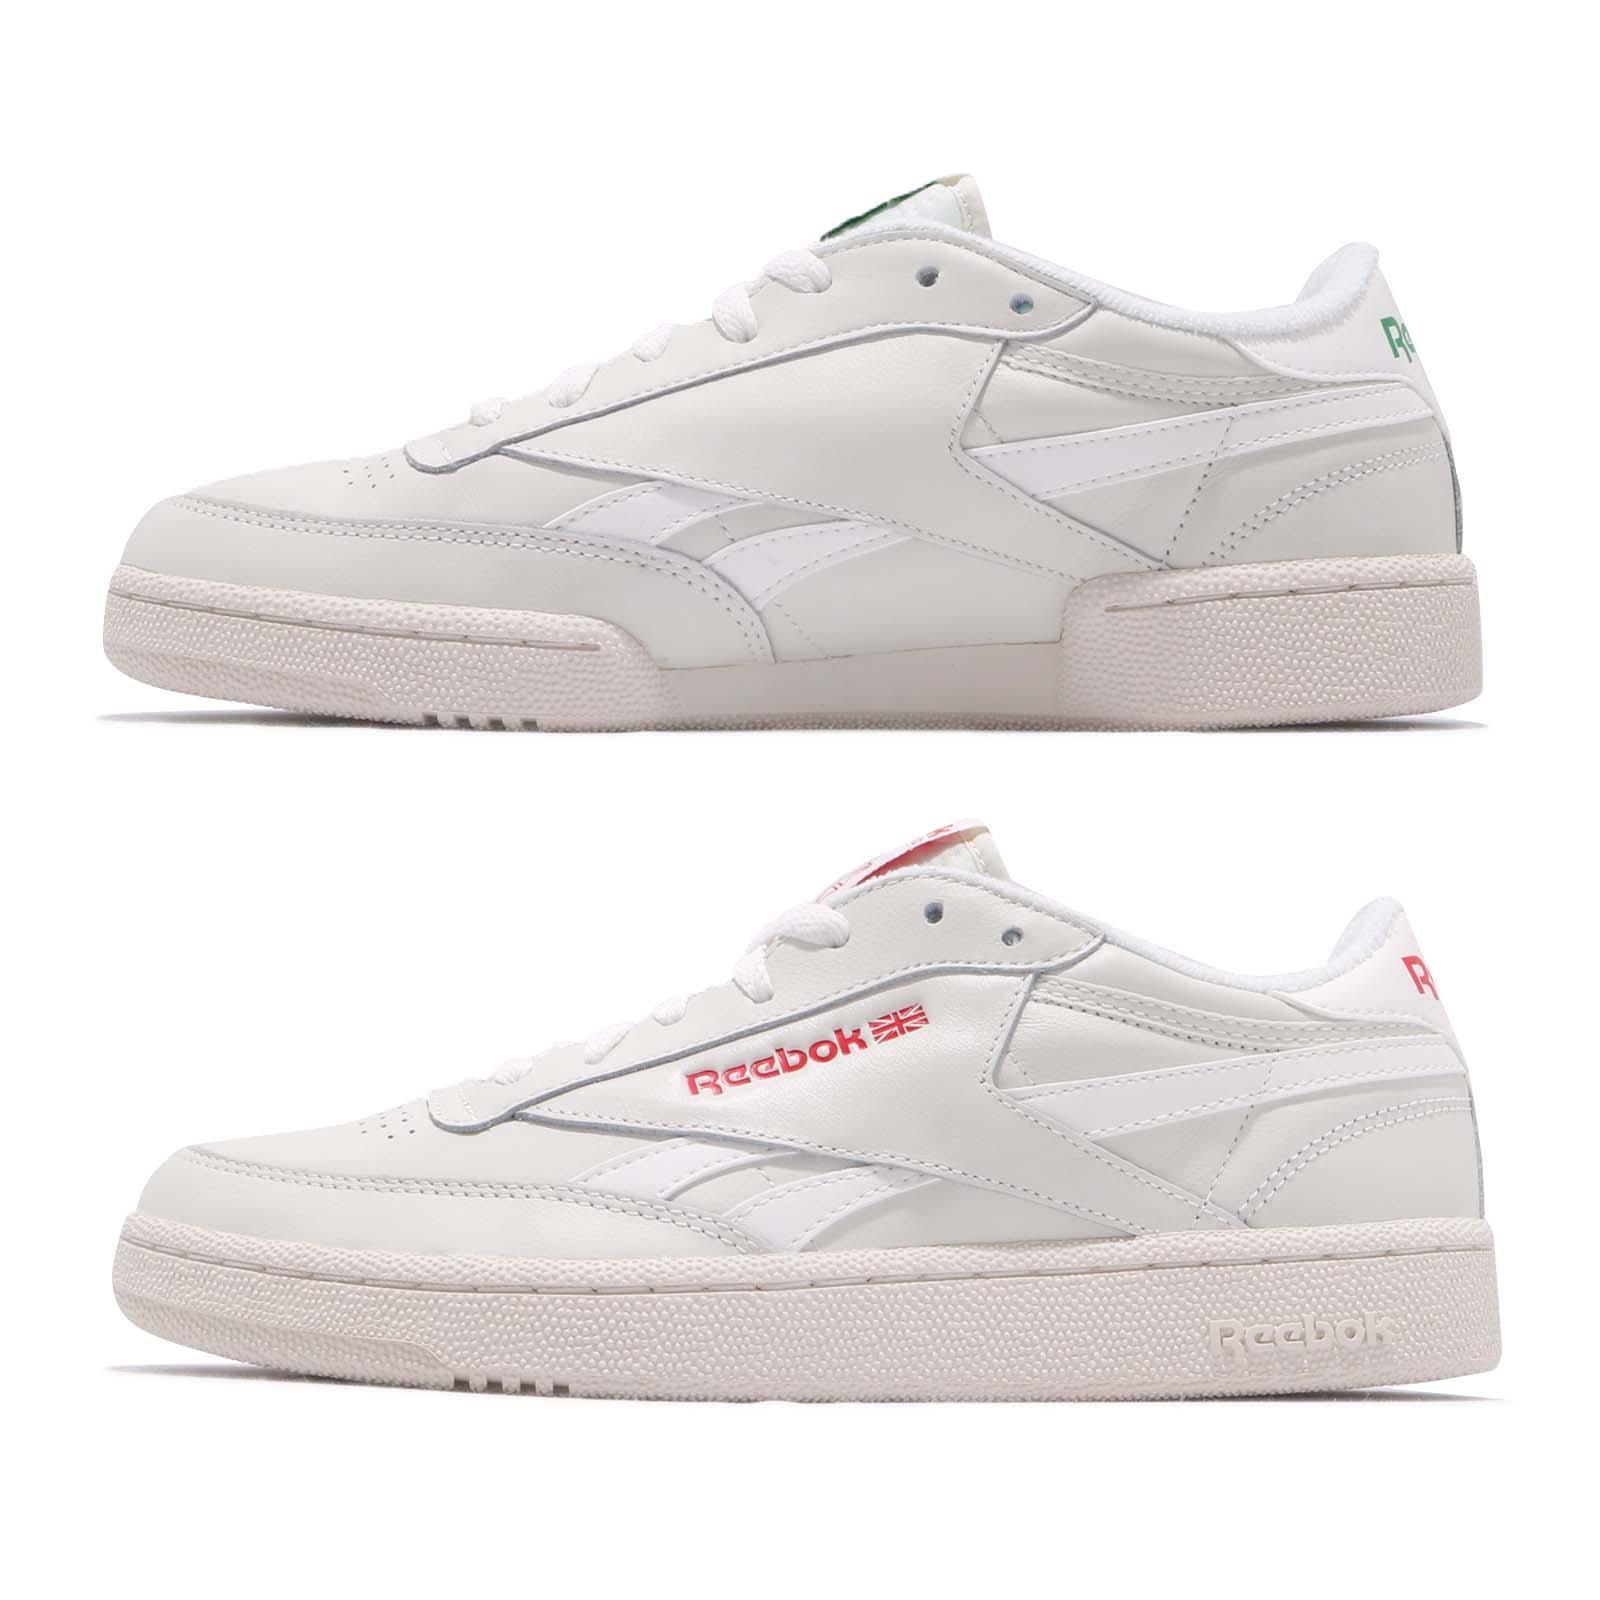 6b4fedb1e2e Reebok Revenge Plus MU Chalk Glen Green Scarlet Men Classic Casual Shoes  DV5181